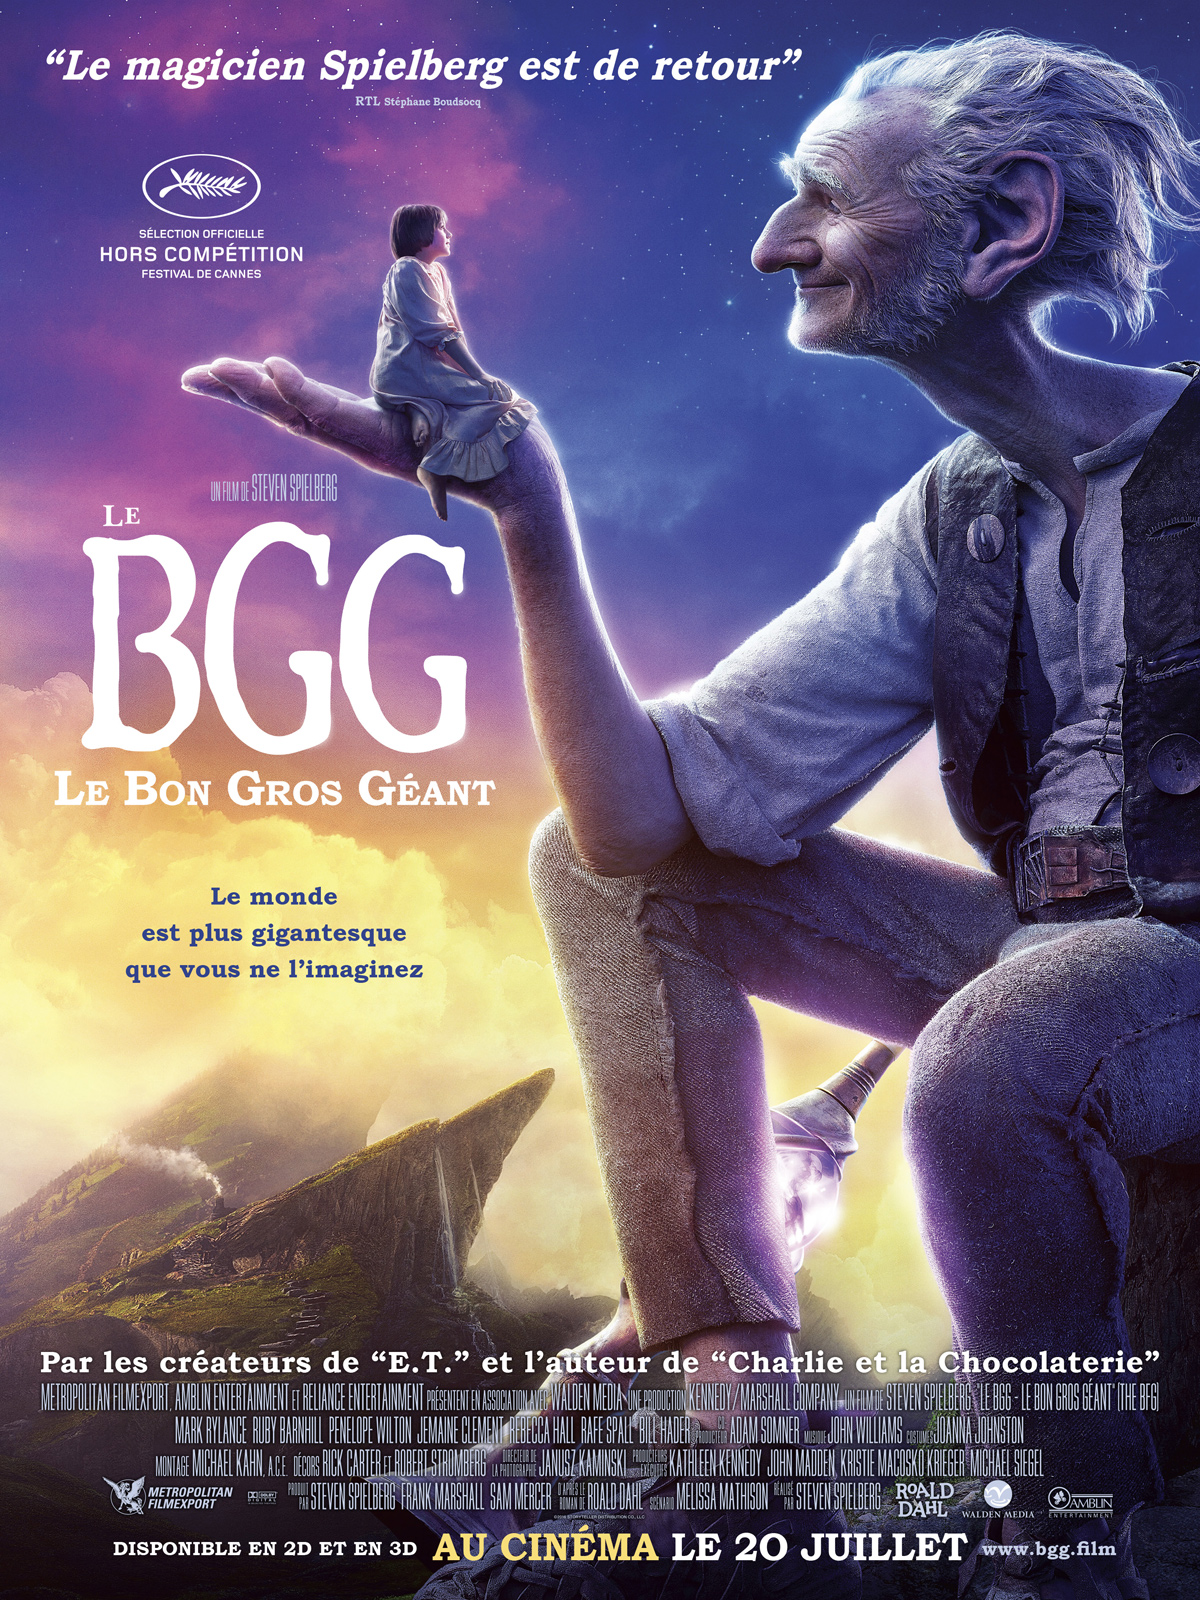 Le BGG ? Le Bon Gros Géant ddl